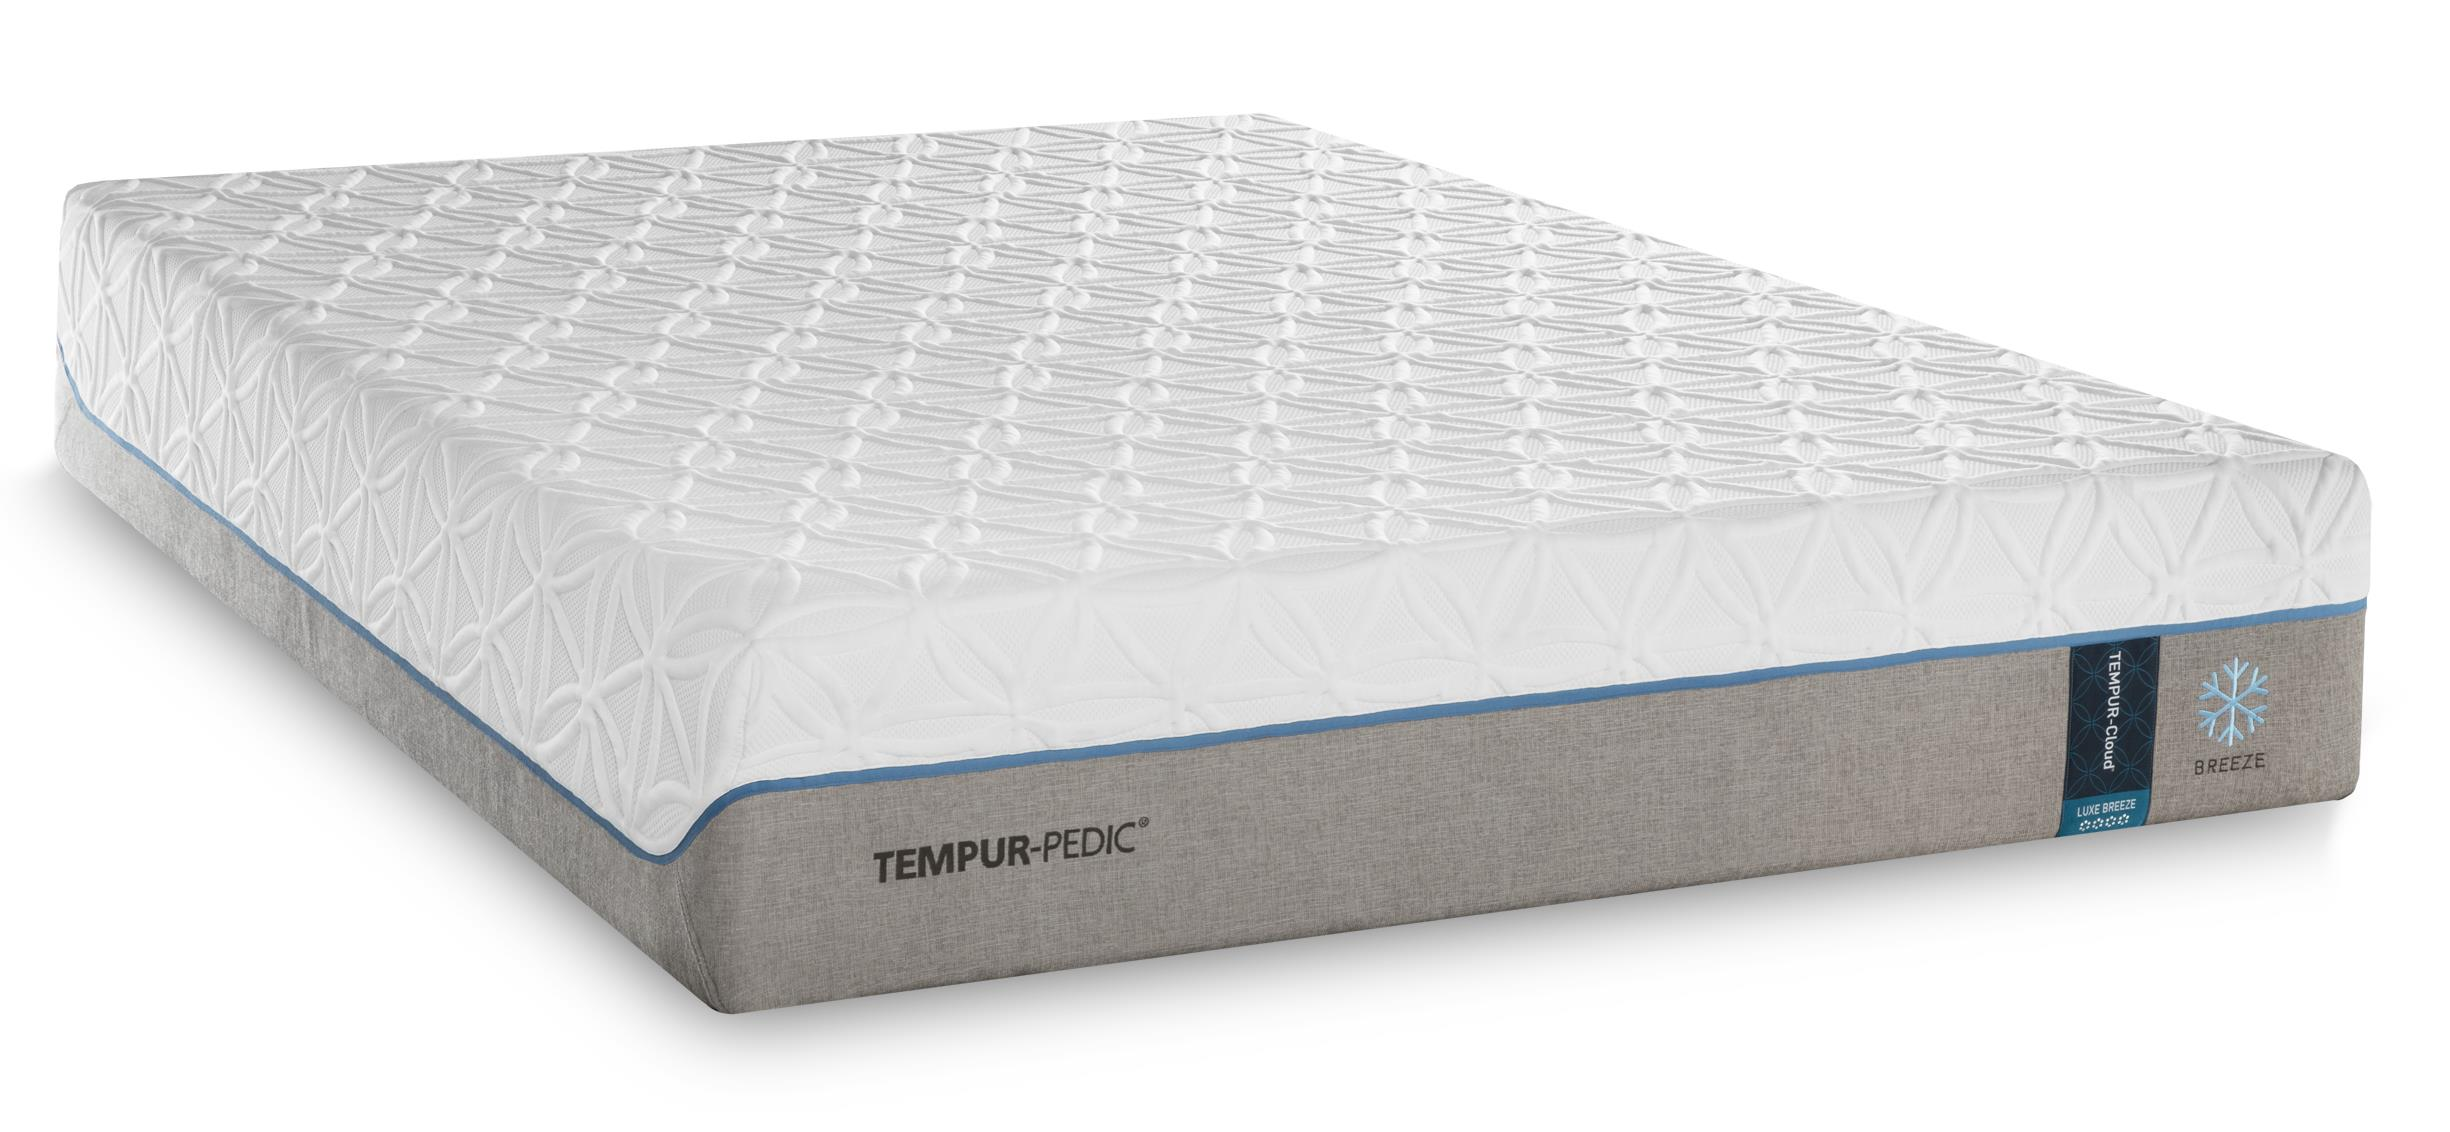 Tempur-Pedic® TEMPUR-Cloud Luxe Breeze 2 Split King Ultra-Soft Mattress Set - Item Number: 2x10109220+2x25565220